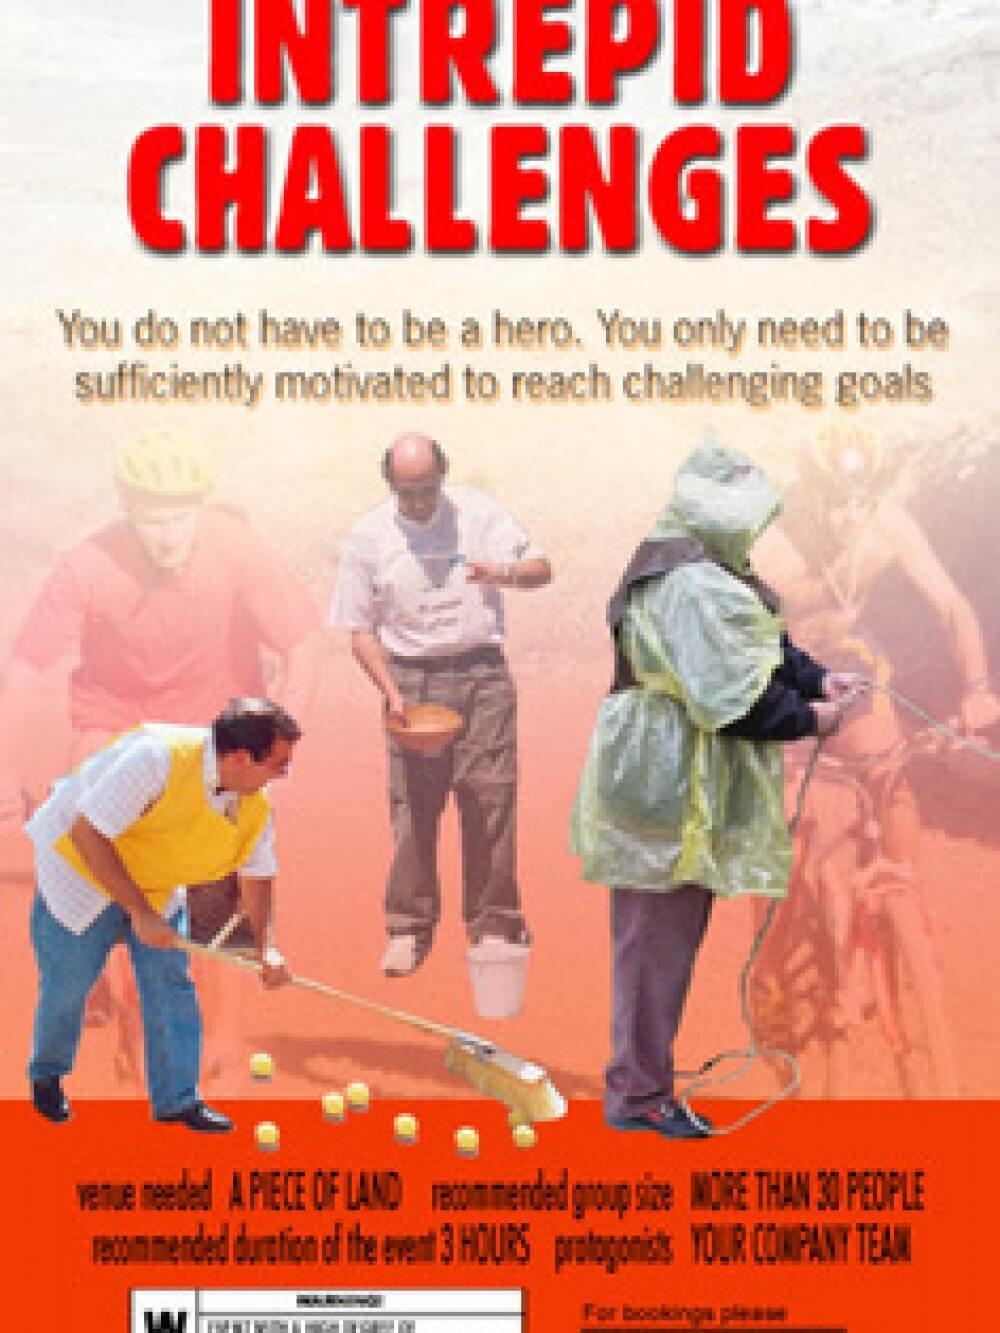 intrepid_challenges_vertical_web